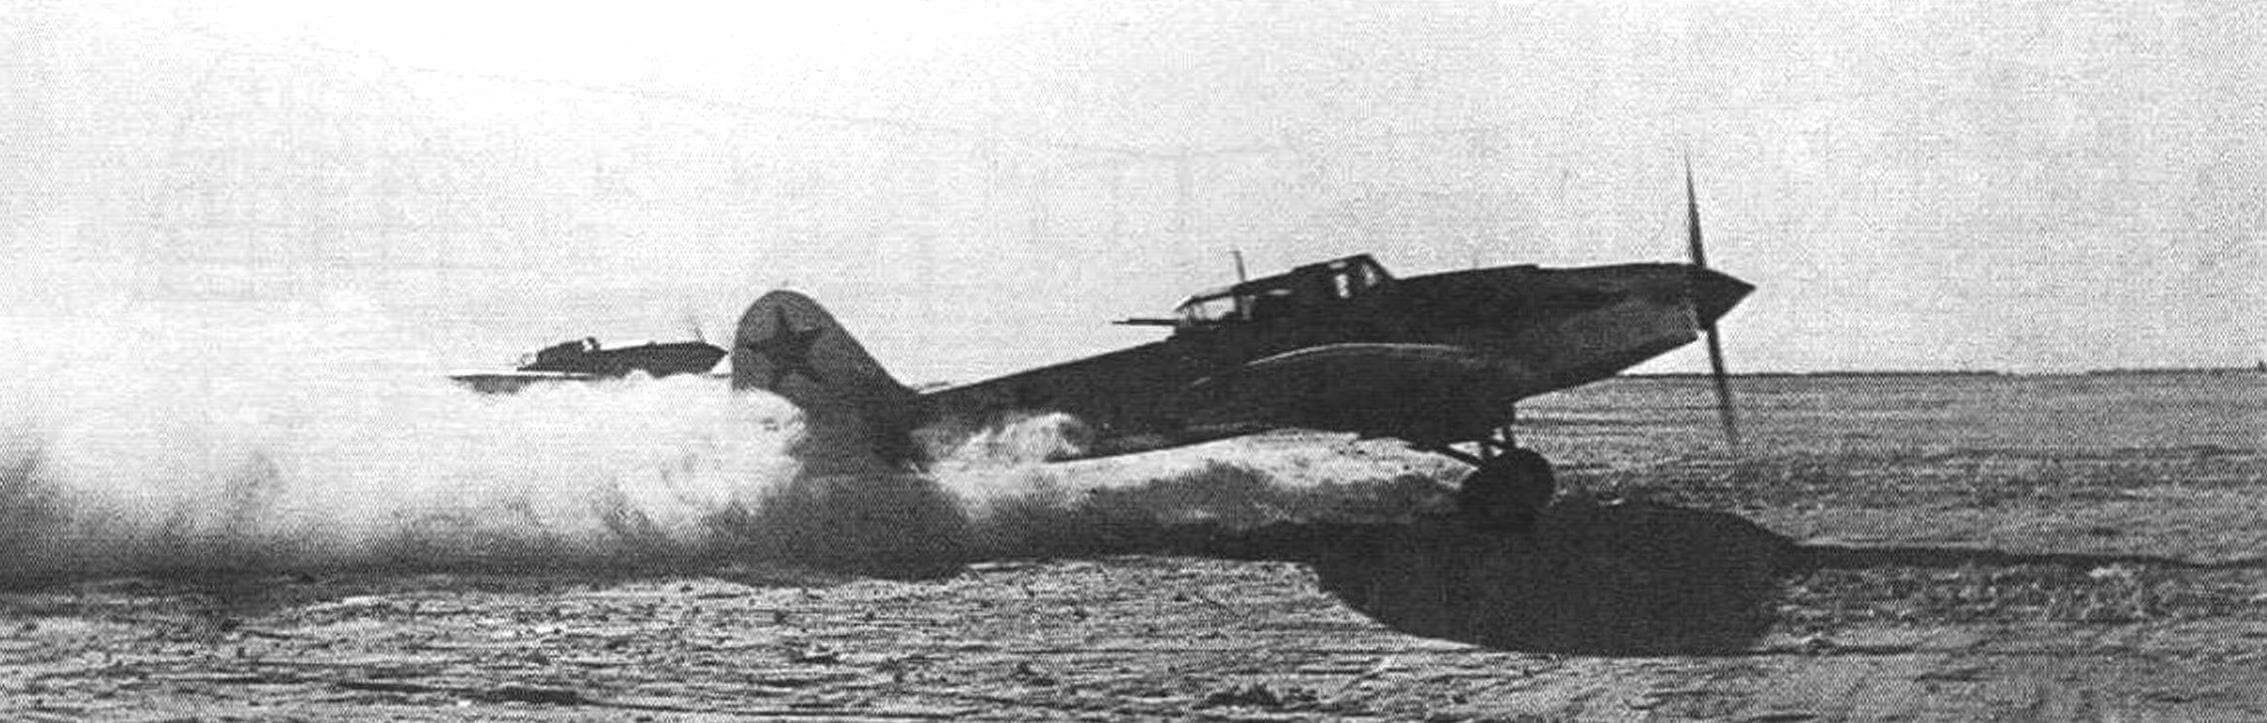 «Летающий танк» - бронированный штурмовик Ил-2